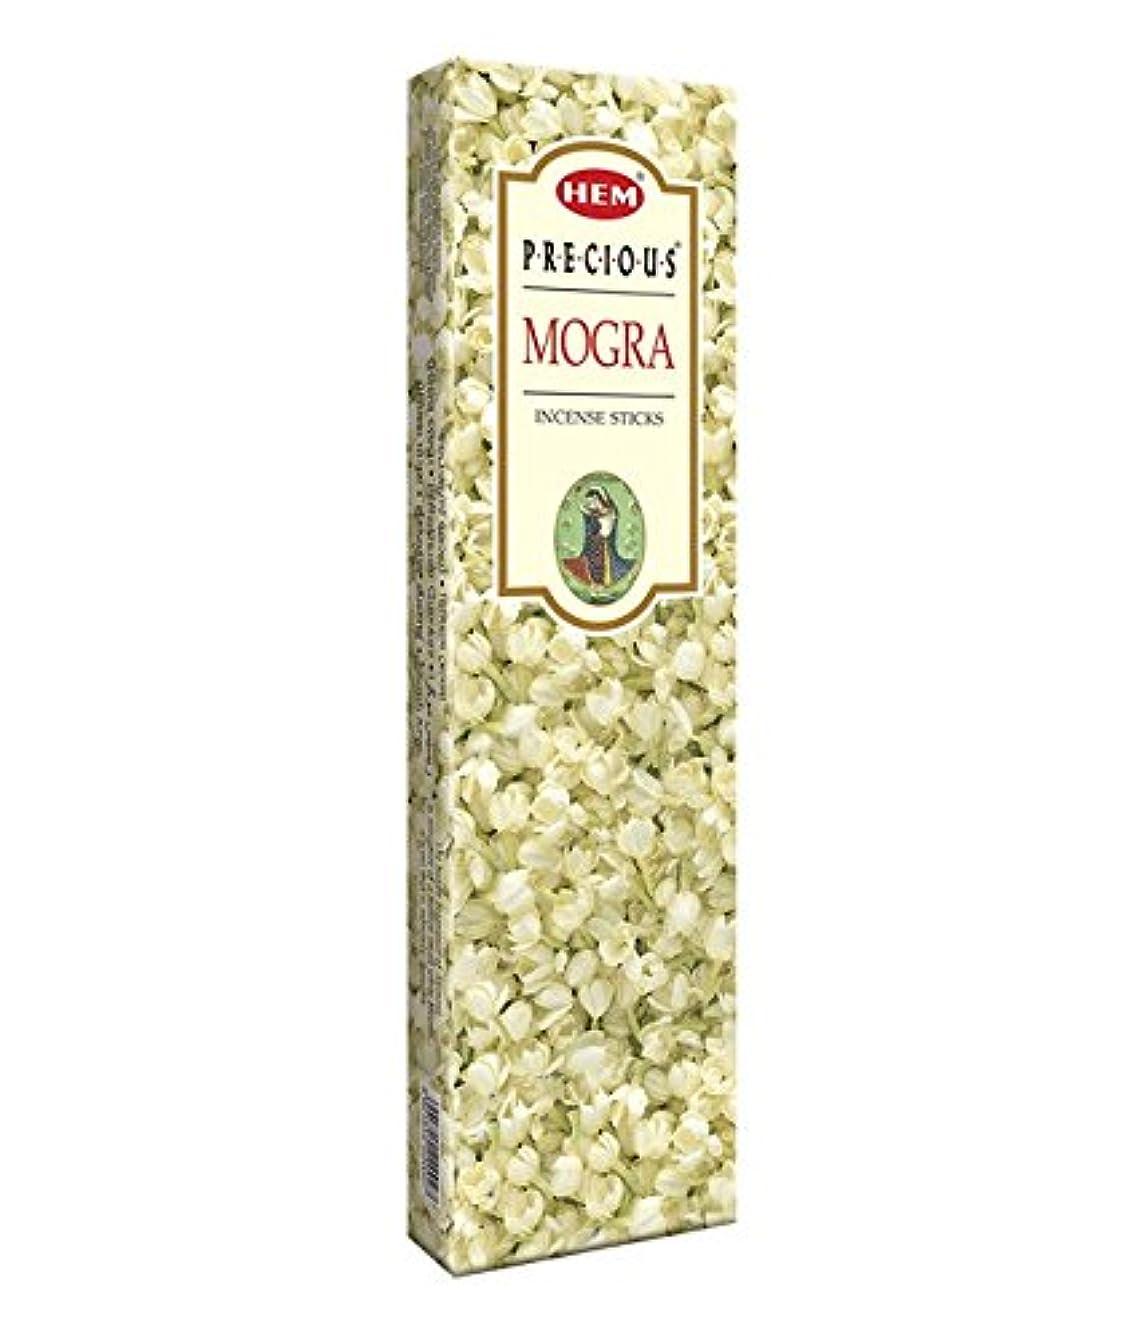 Agarbathi Fragrance Hem Precious Mogra 100 g INCENSE STICKS